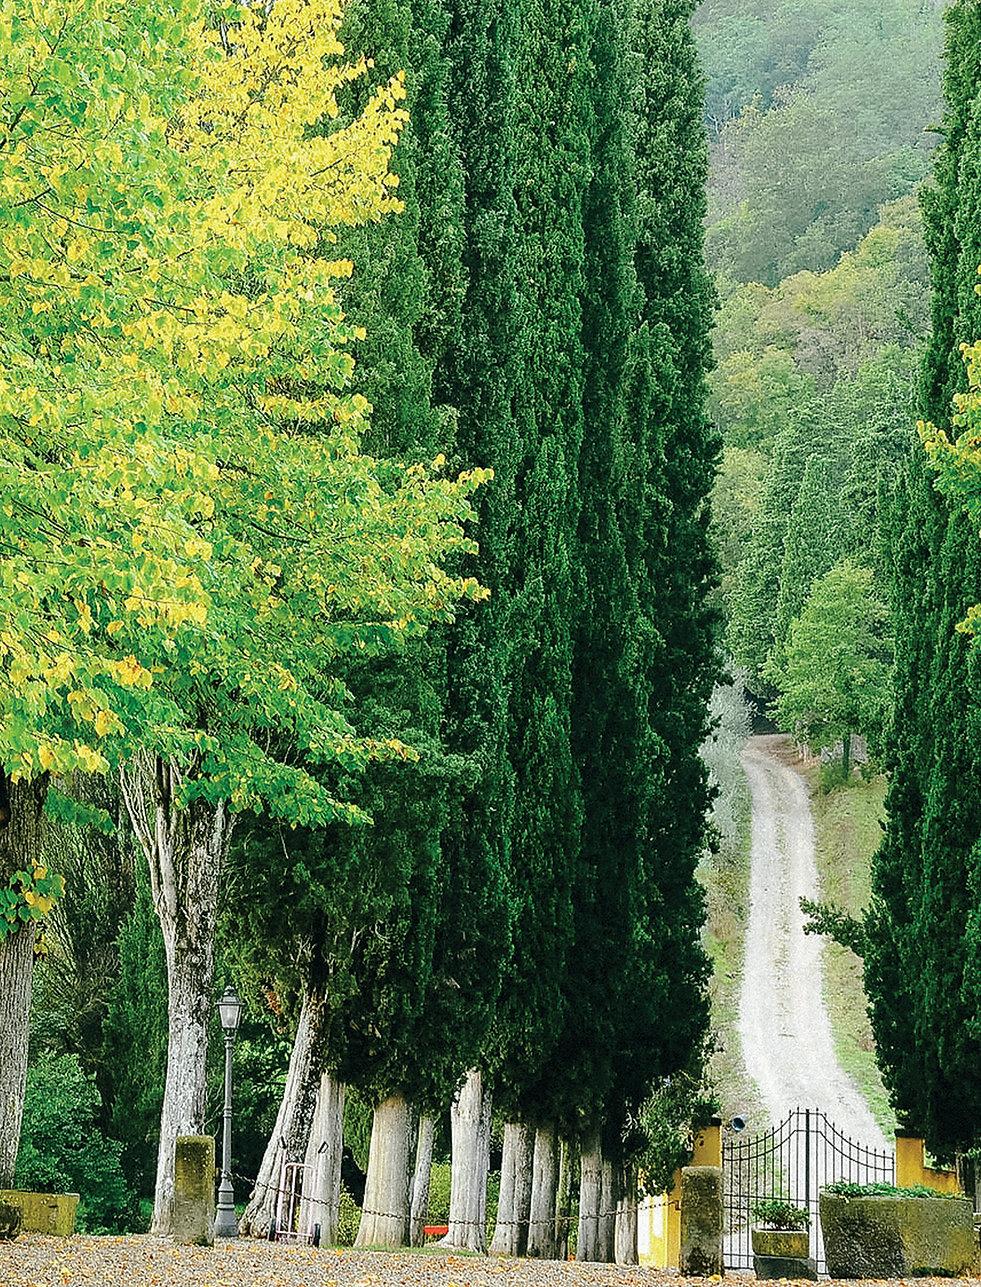 San Fedele, Italy